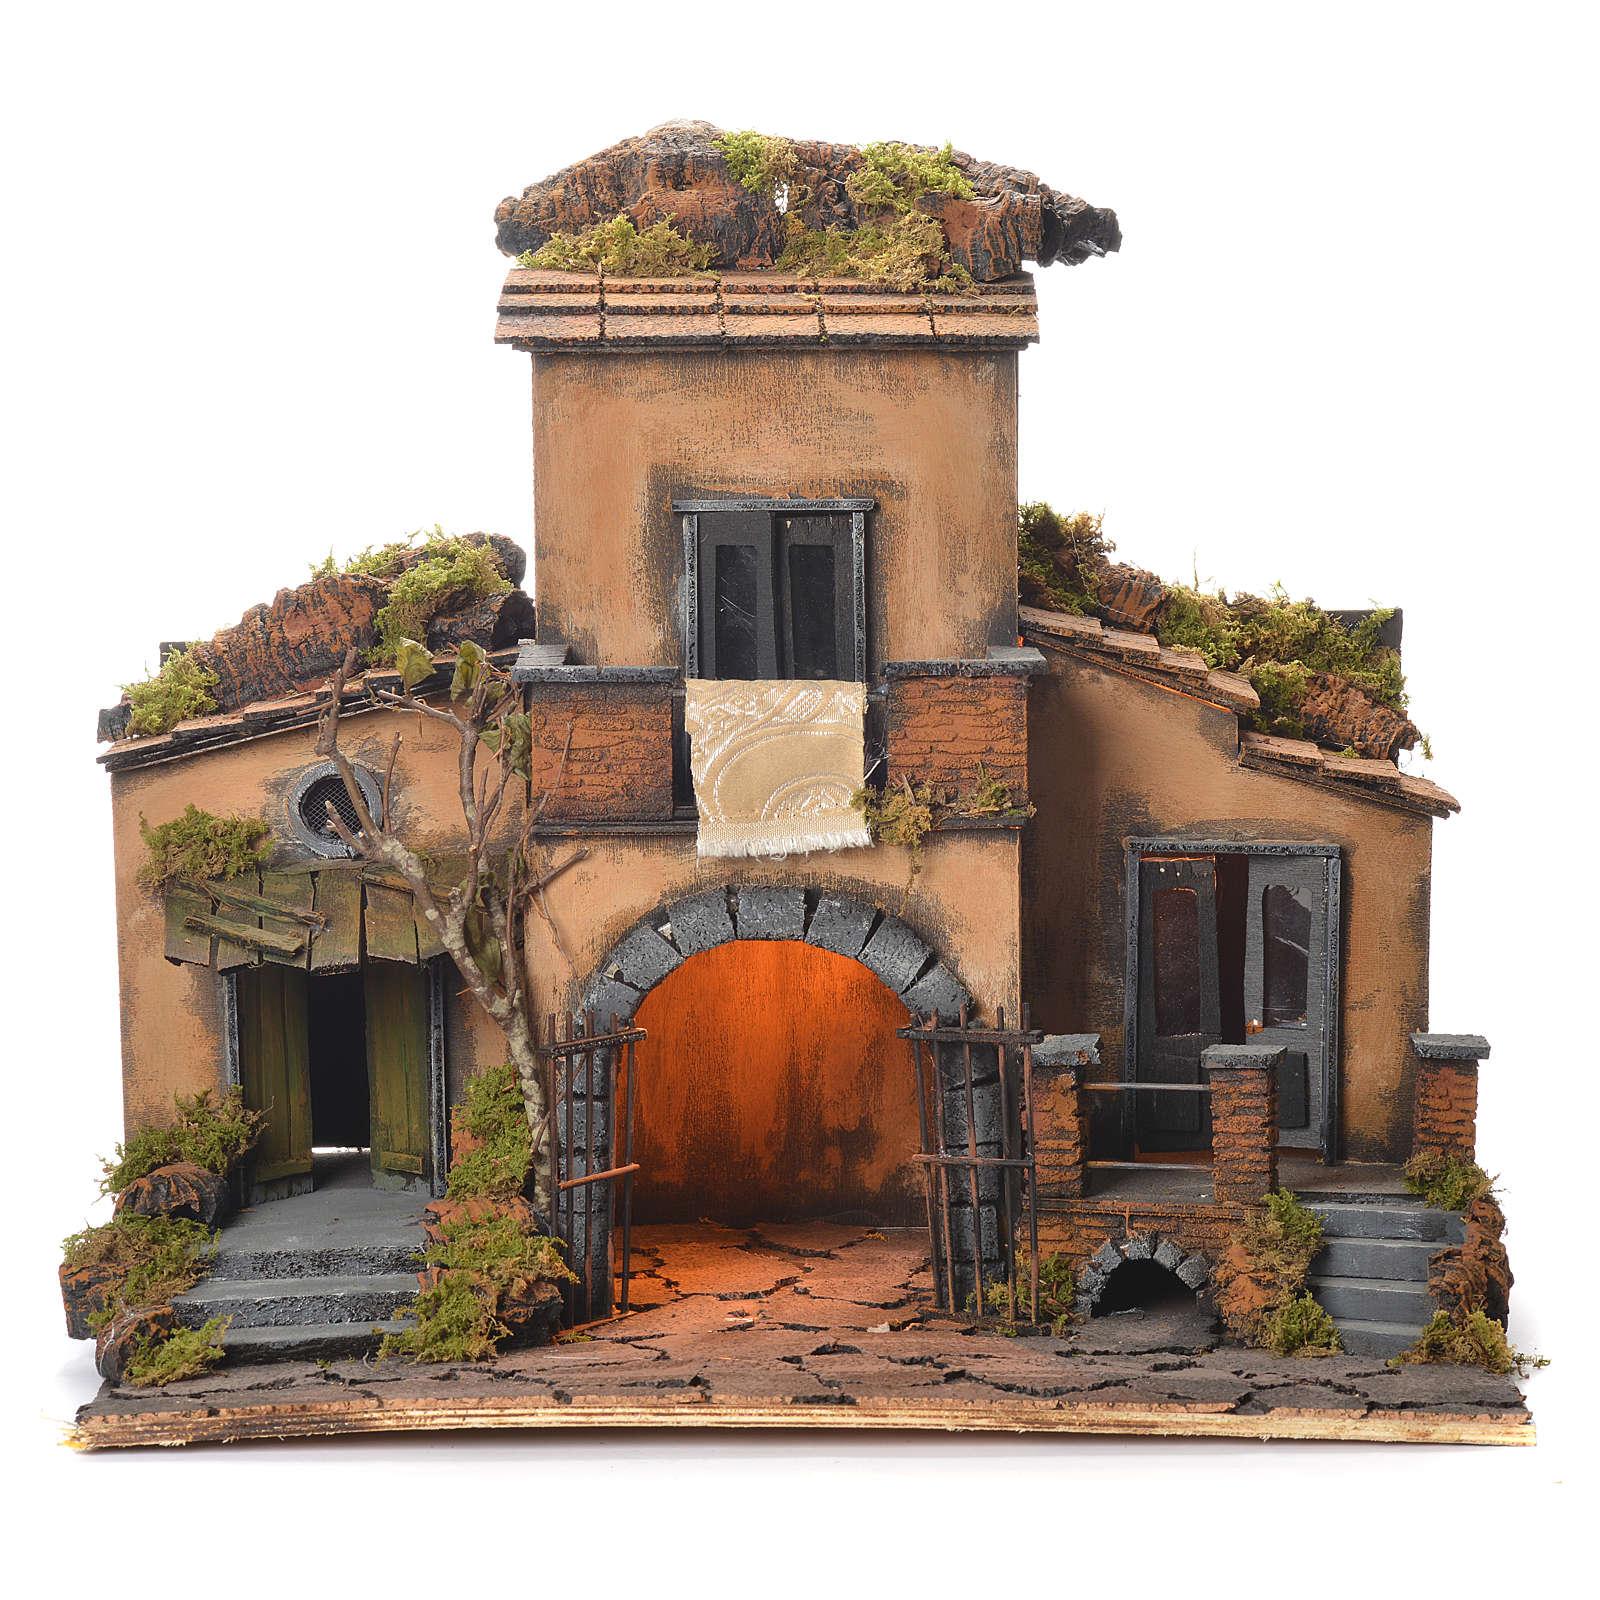 Borgo presepe napoletano stile 700 con cancello 48x55x35 4